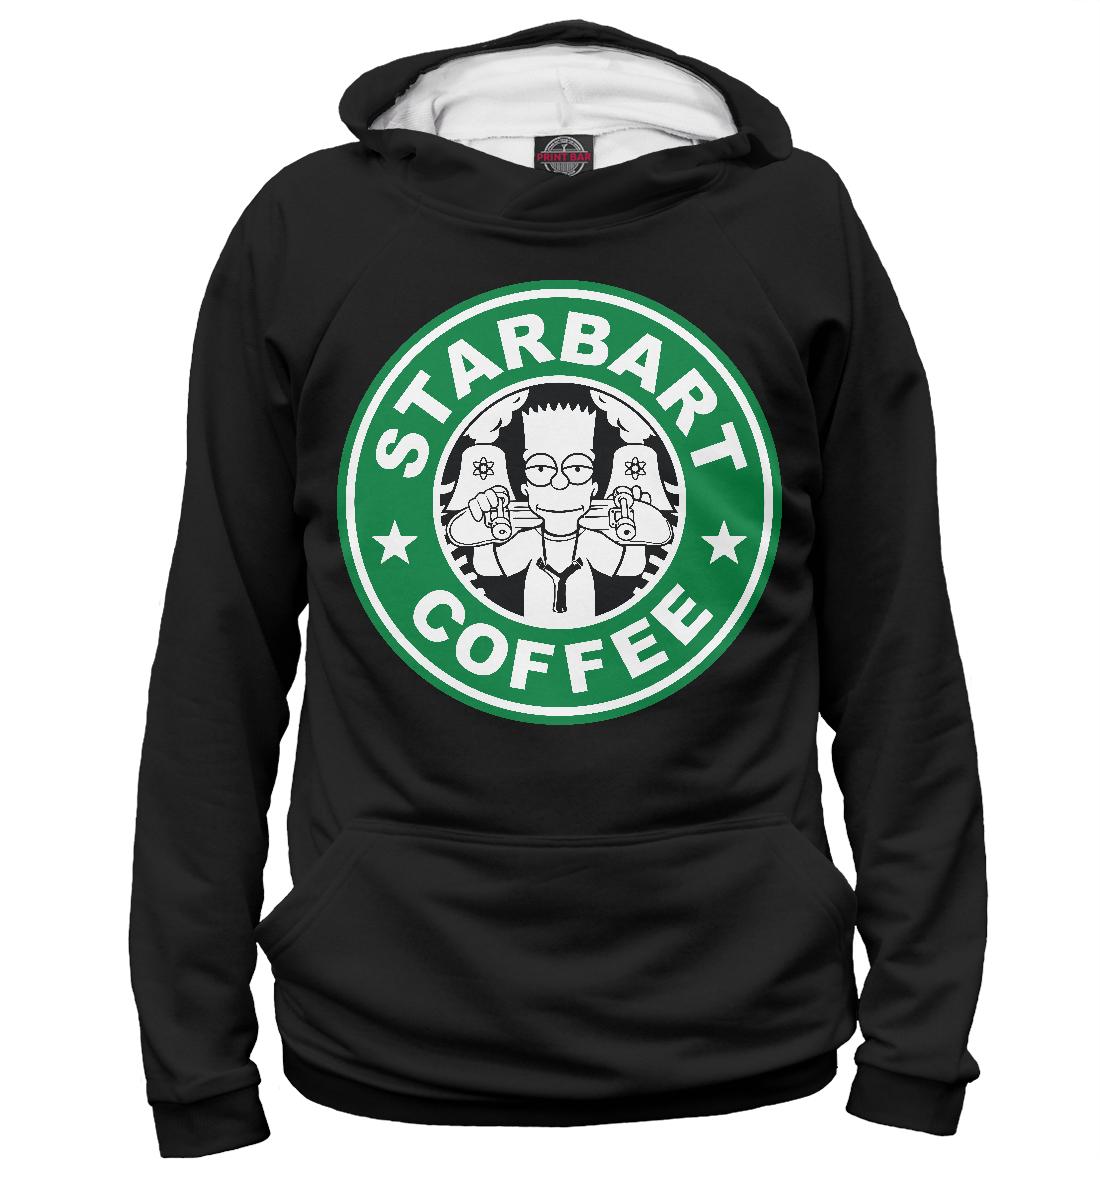 Купить Starbart Coffee, Printbar, Худи, SIM-961595-hud-2